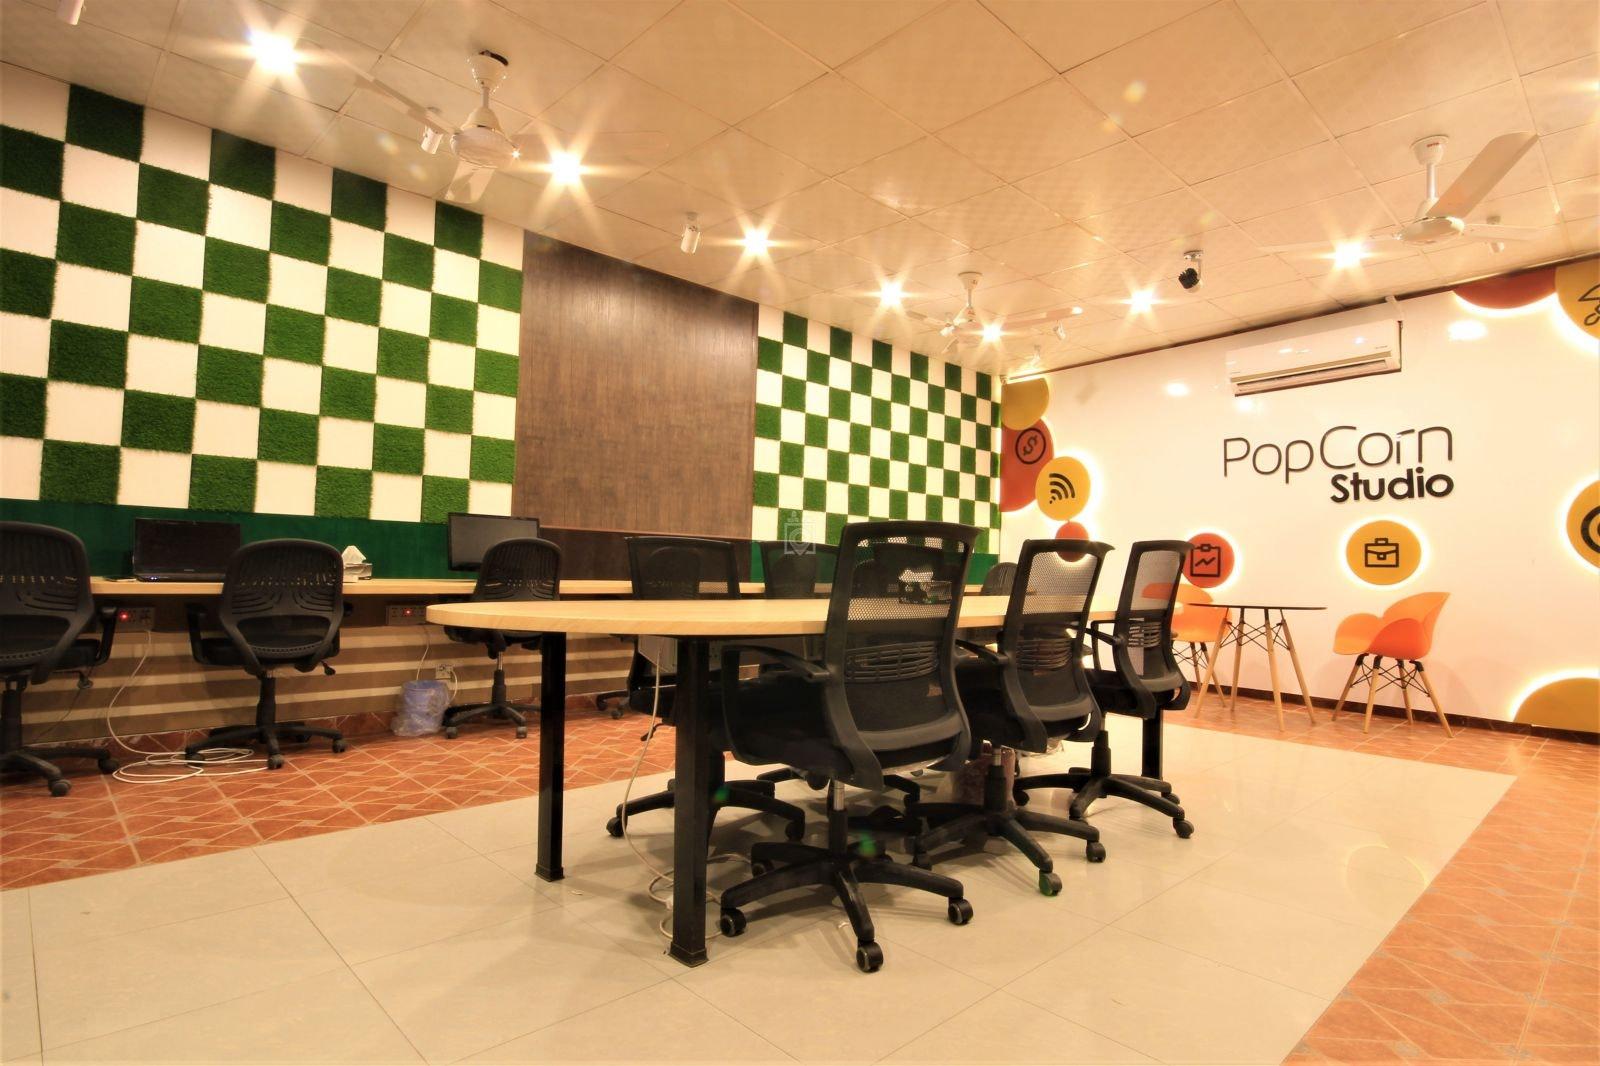 Studio La Rosa Palermo popcorn studio, lahore - book online - coworker